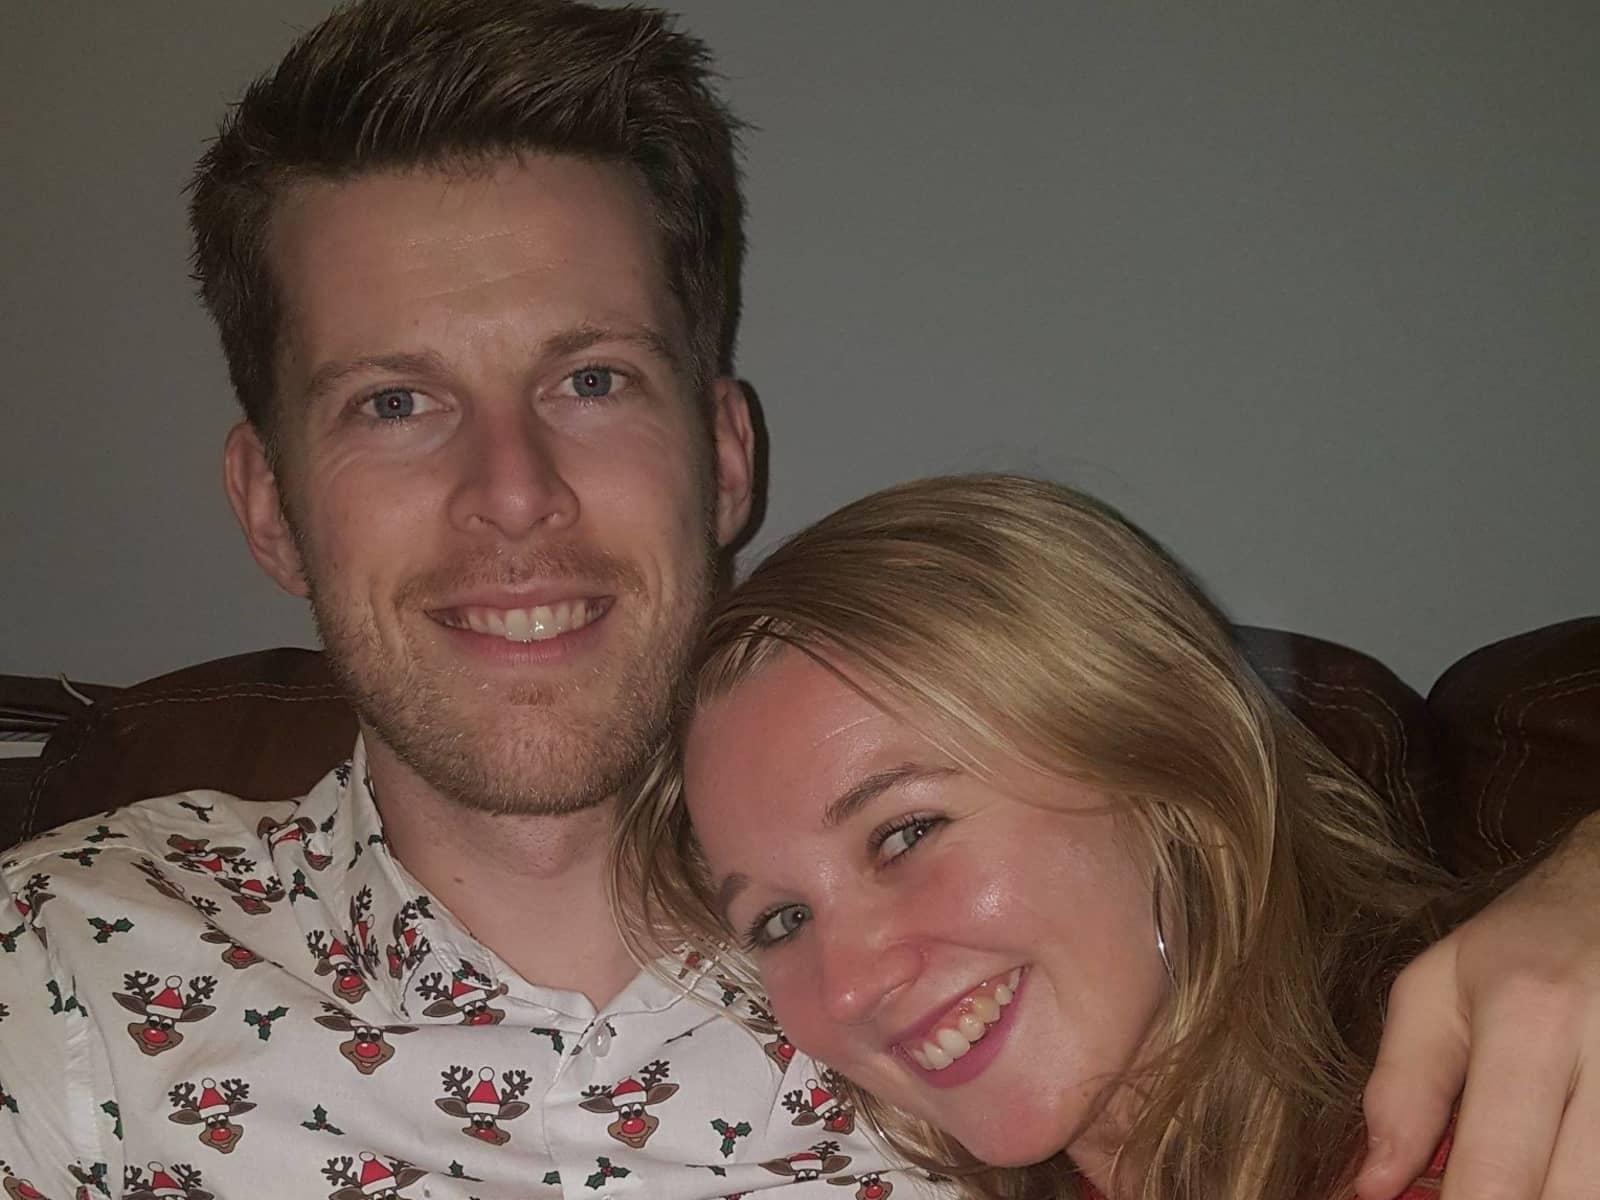 Samantha & Ben from Manchester, United Kingdom